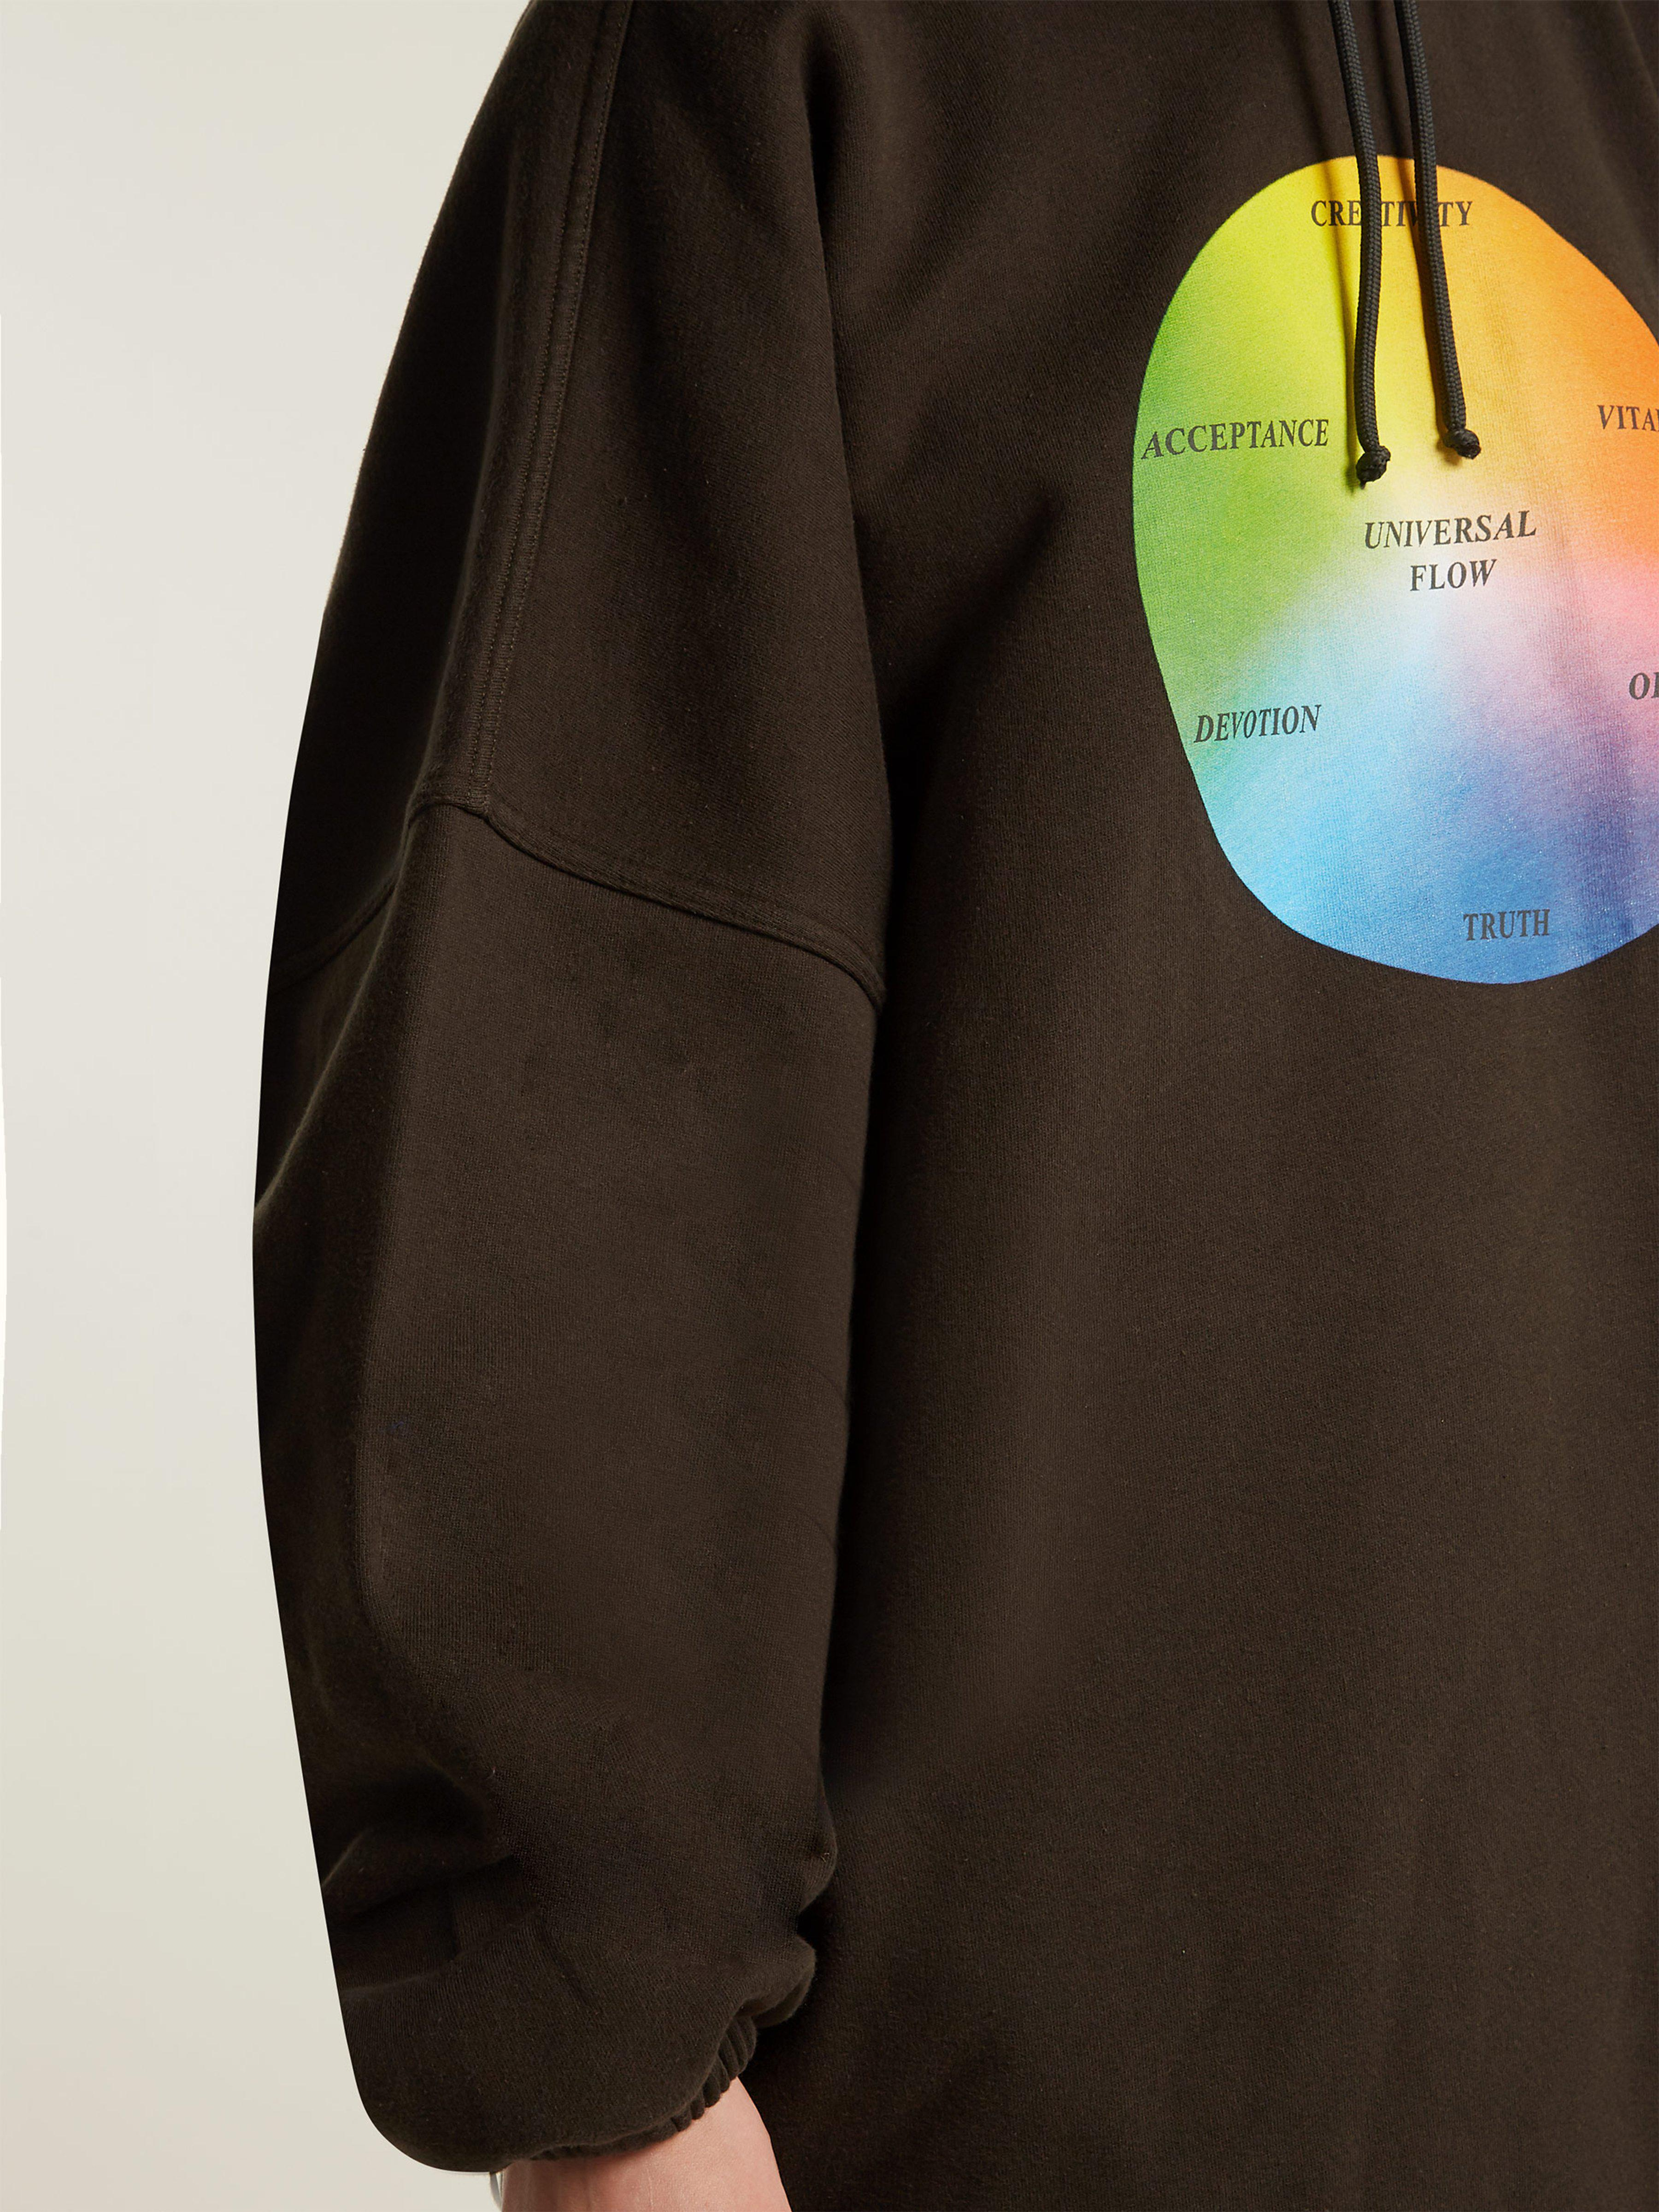 c1a3b1600 Balenciaga - Black Universal Flow Cotton Jersey Hooded Sweatshirt - Lyst.  View fullscreen